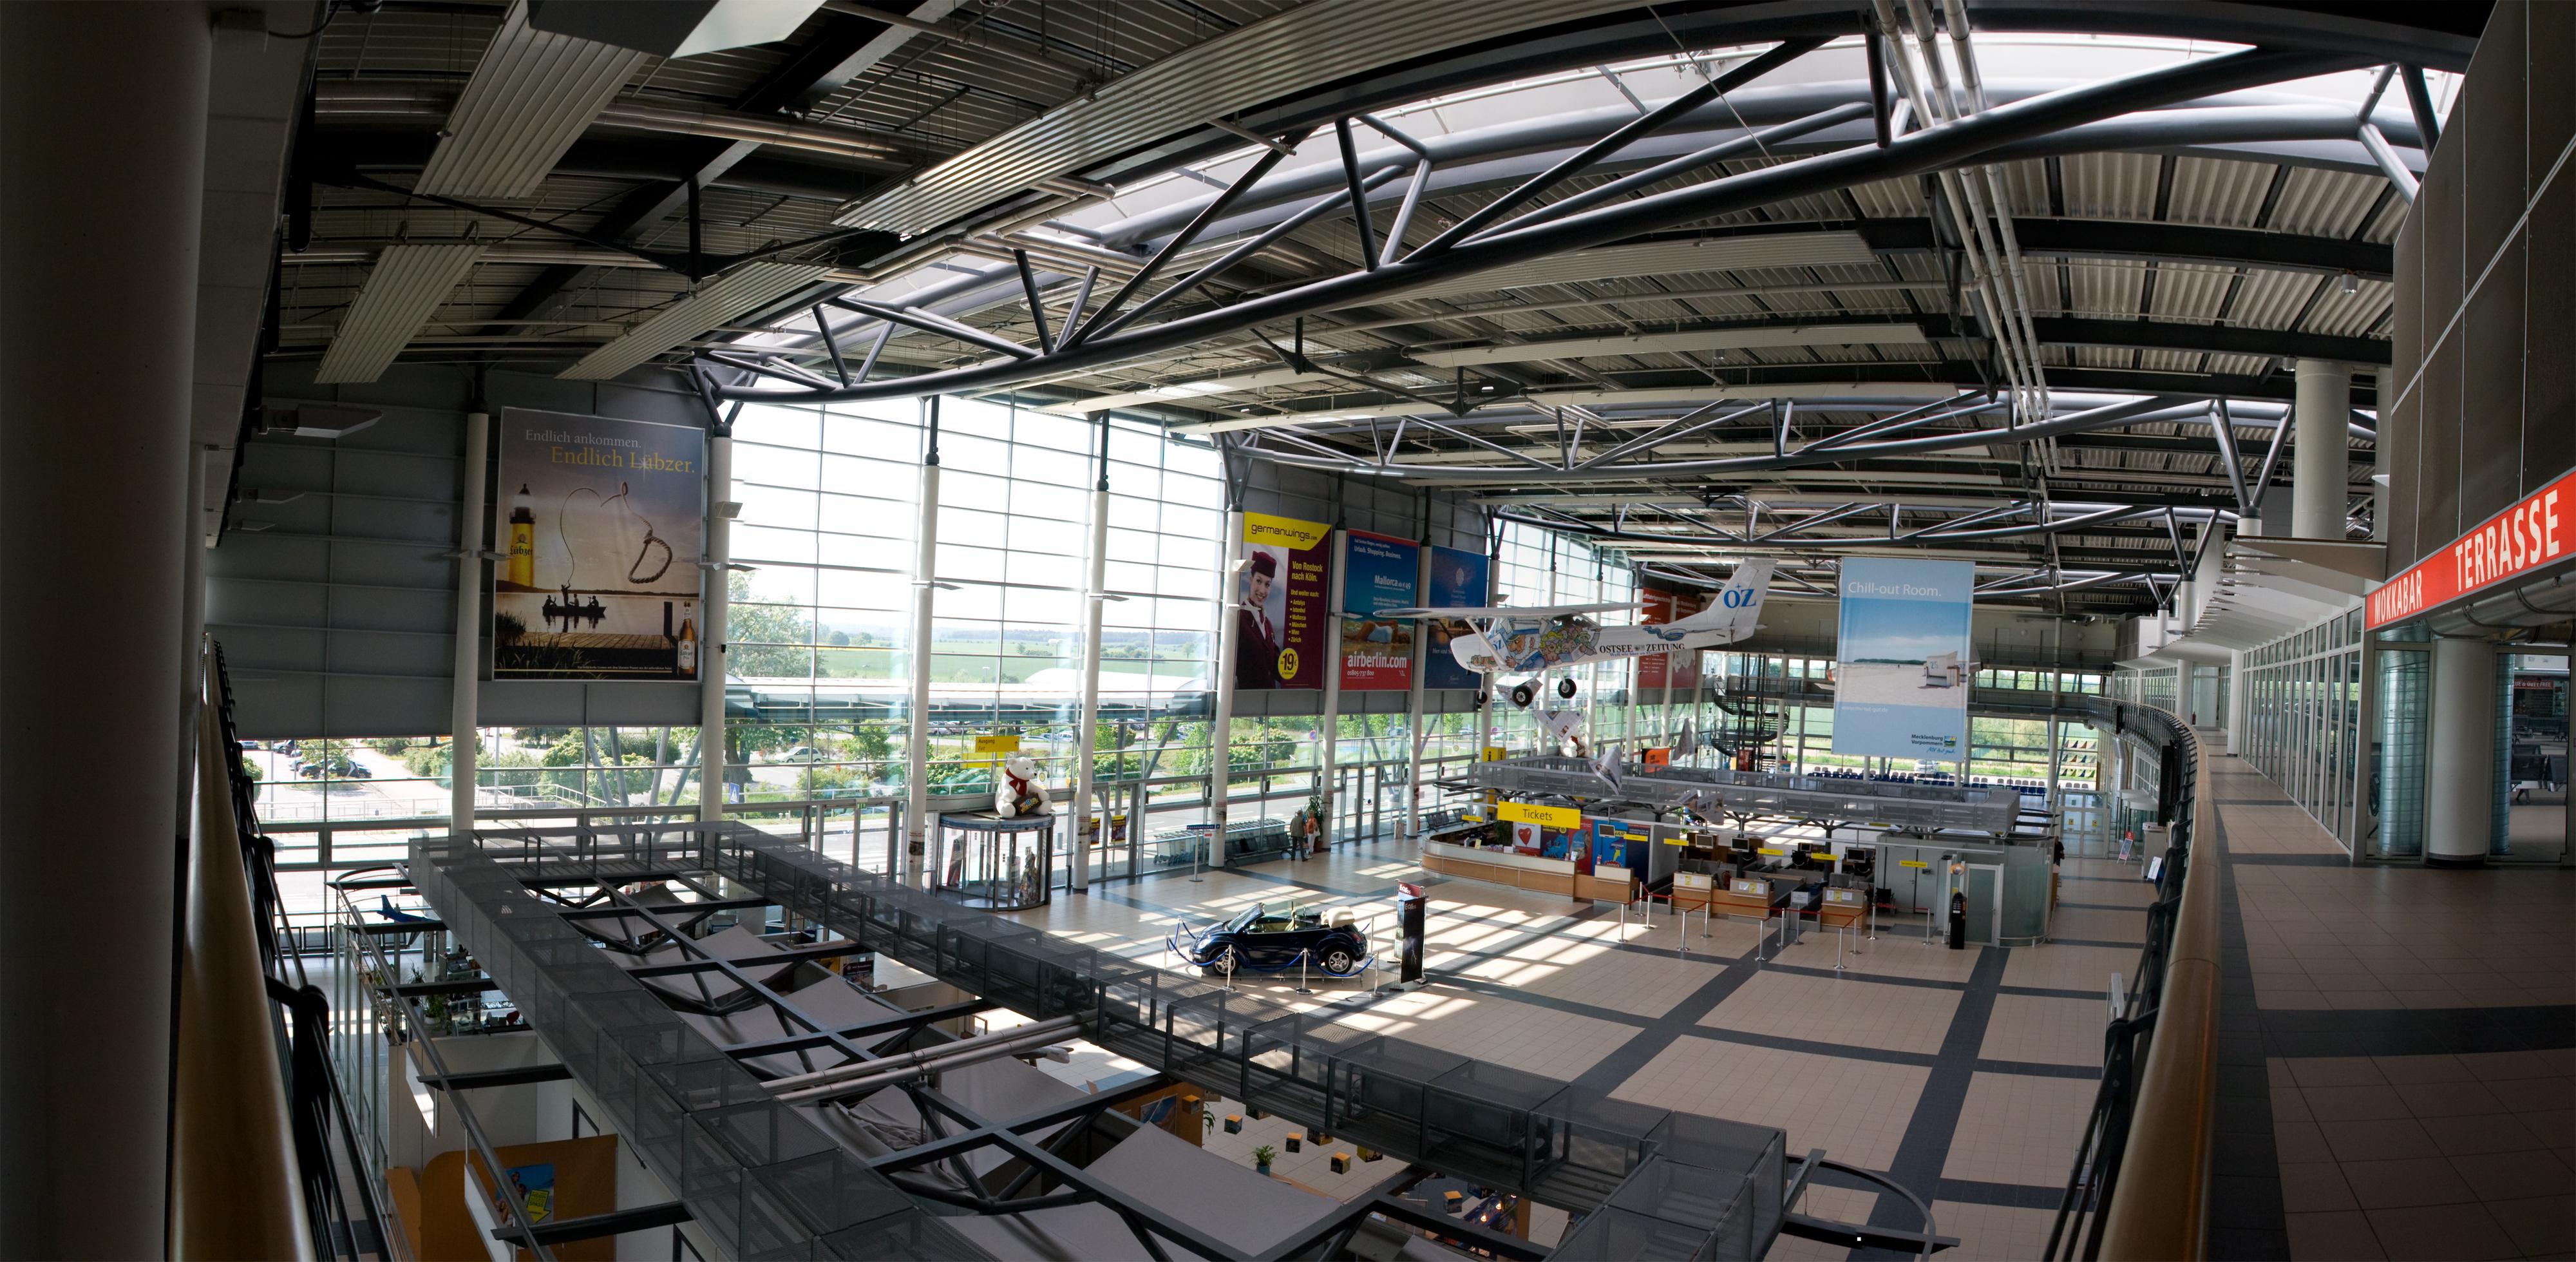 Airport Rostock Laage